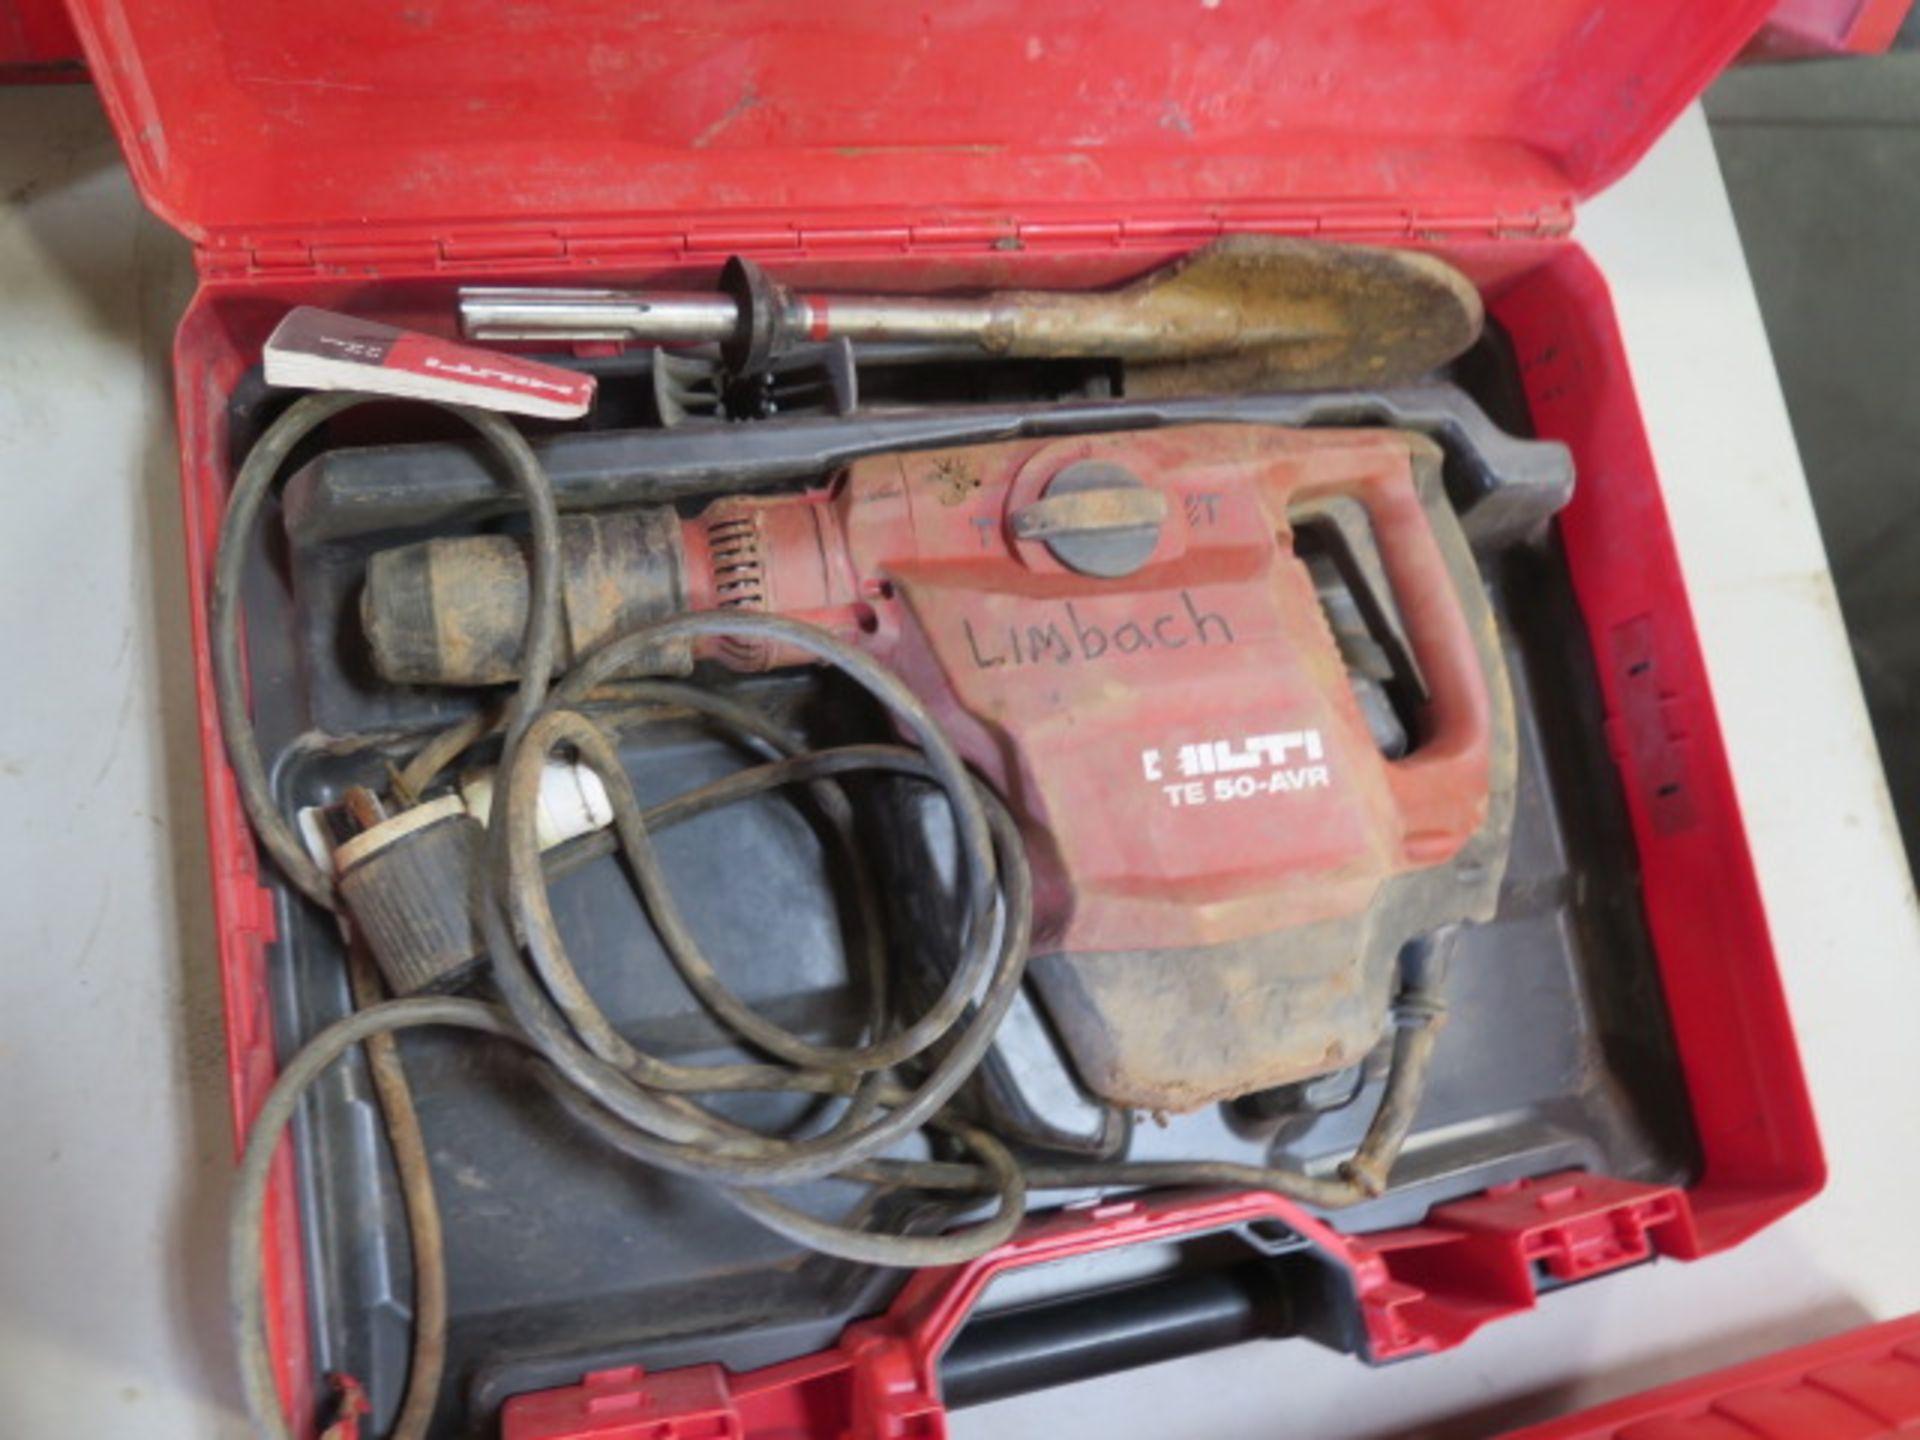 Hilti TE 50-AVR Hammer Drill (SOLD AS-IS - NO WARRANTY)